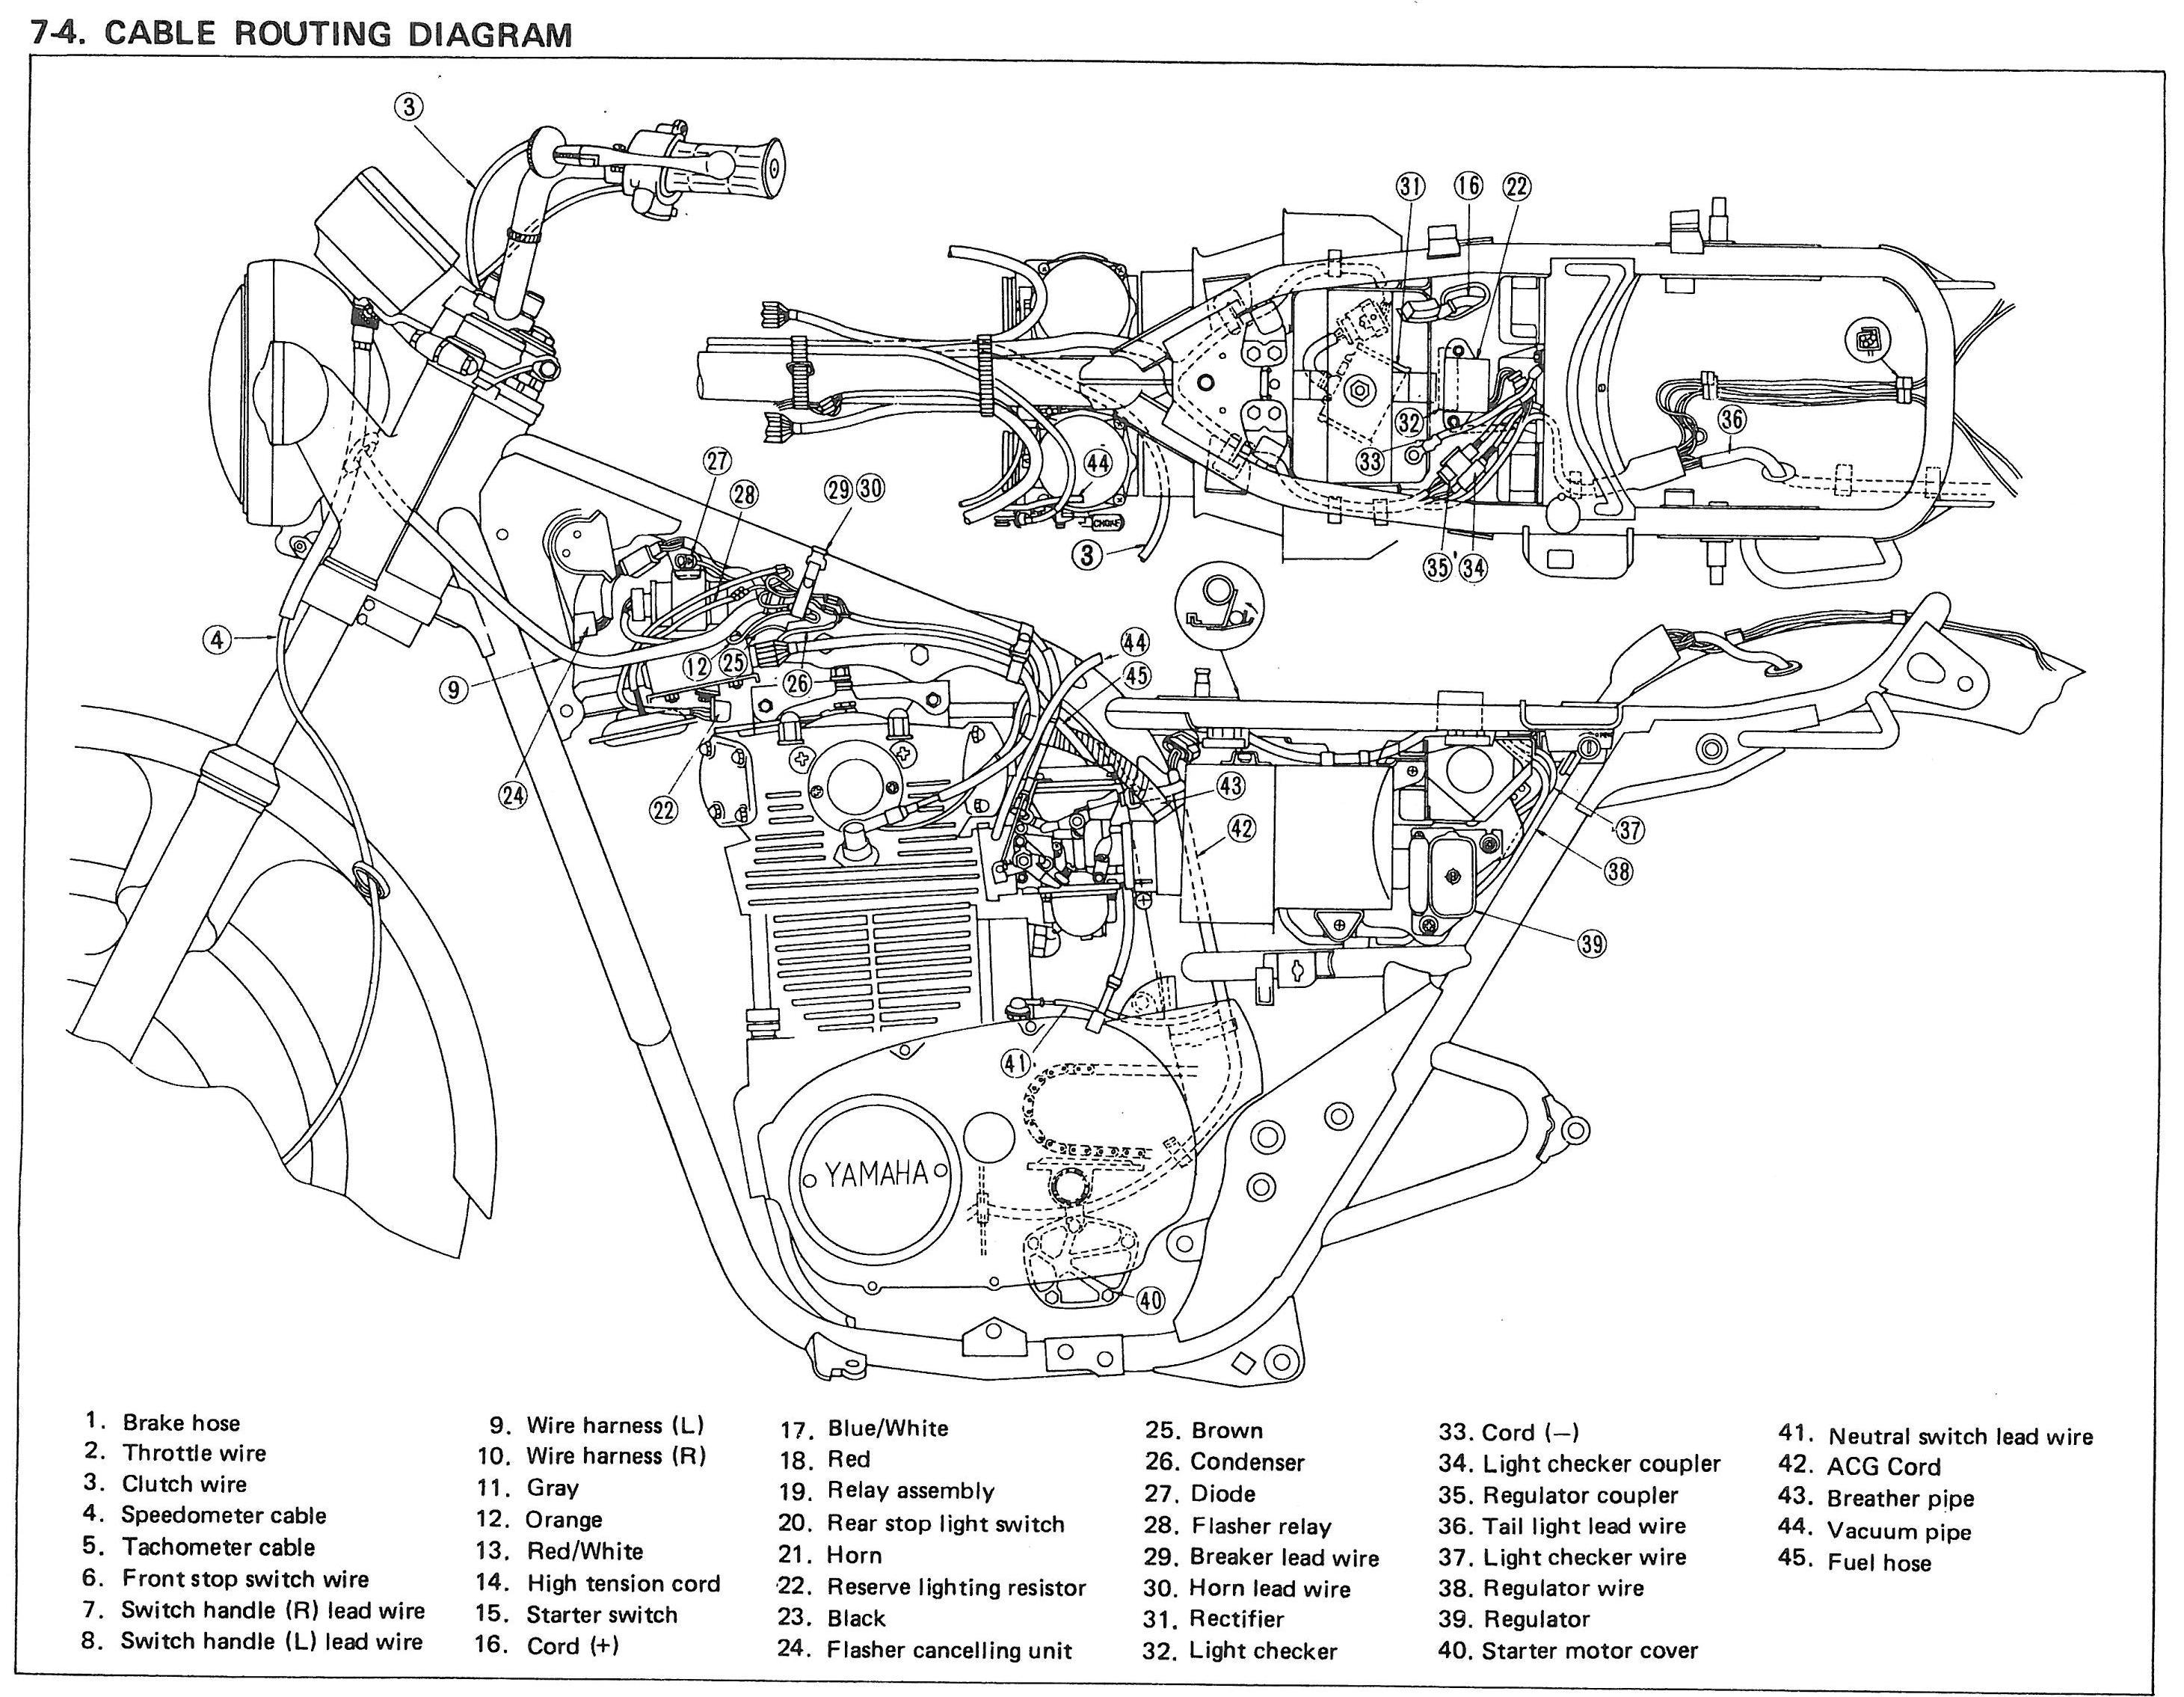 hight resolution of xs650 oil diagram schematics wiring diagrams u2022 rh seniorlivinguniversity co xs650 carburetor diagram yamaha xs650 engine